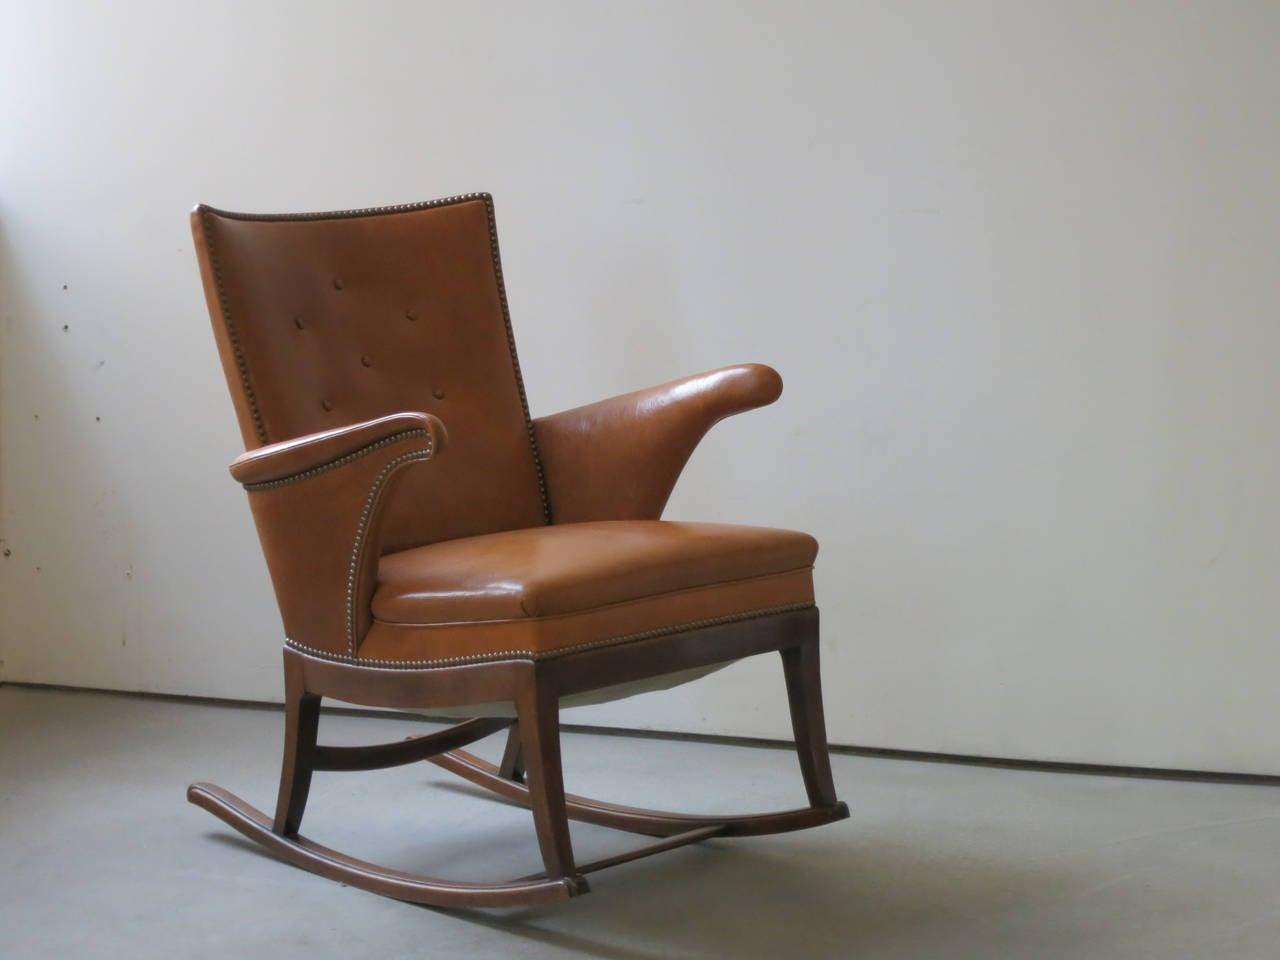 Scandinavian Modern 1930s Rocking Chair by Frits Henningsen For Sale